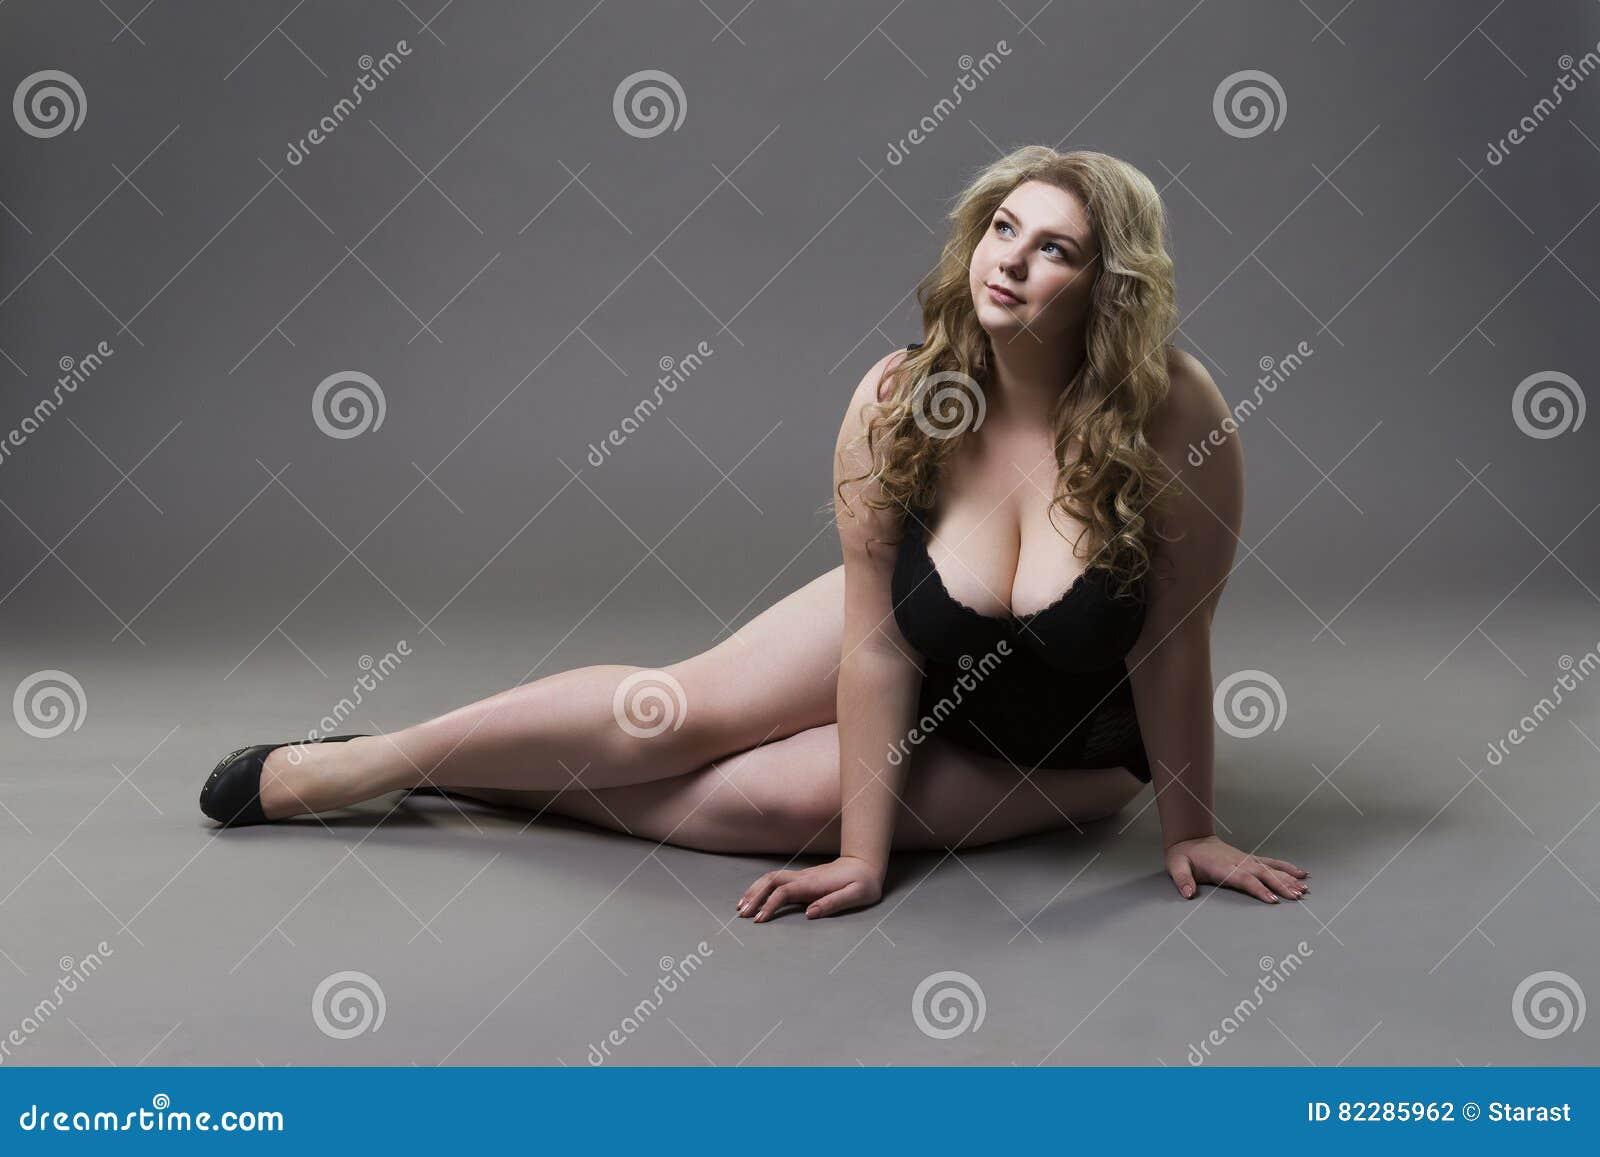 Telugu young girl nude